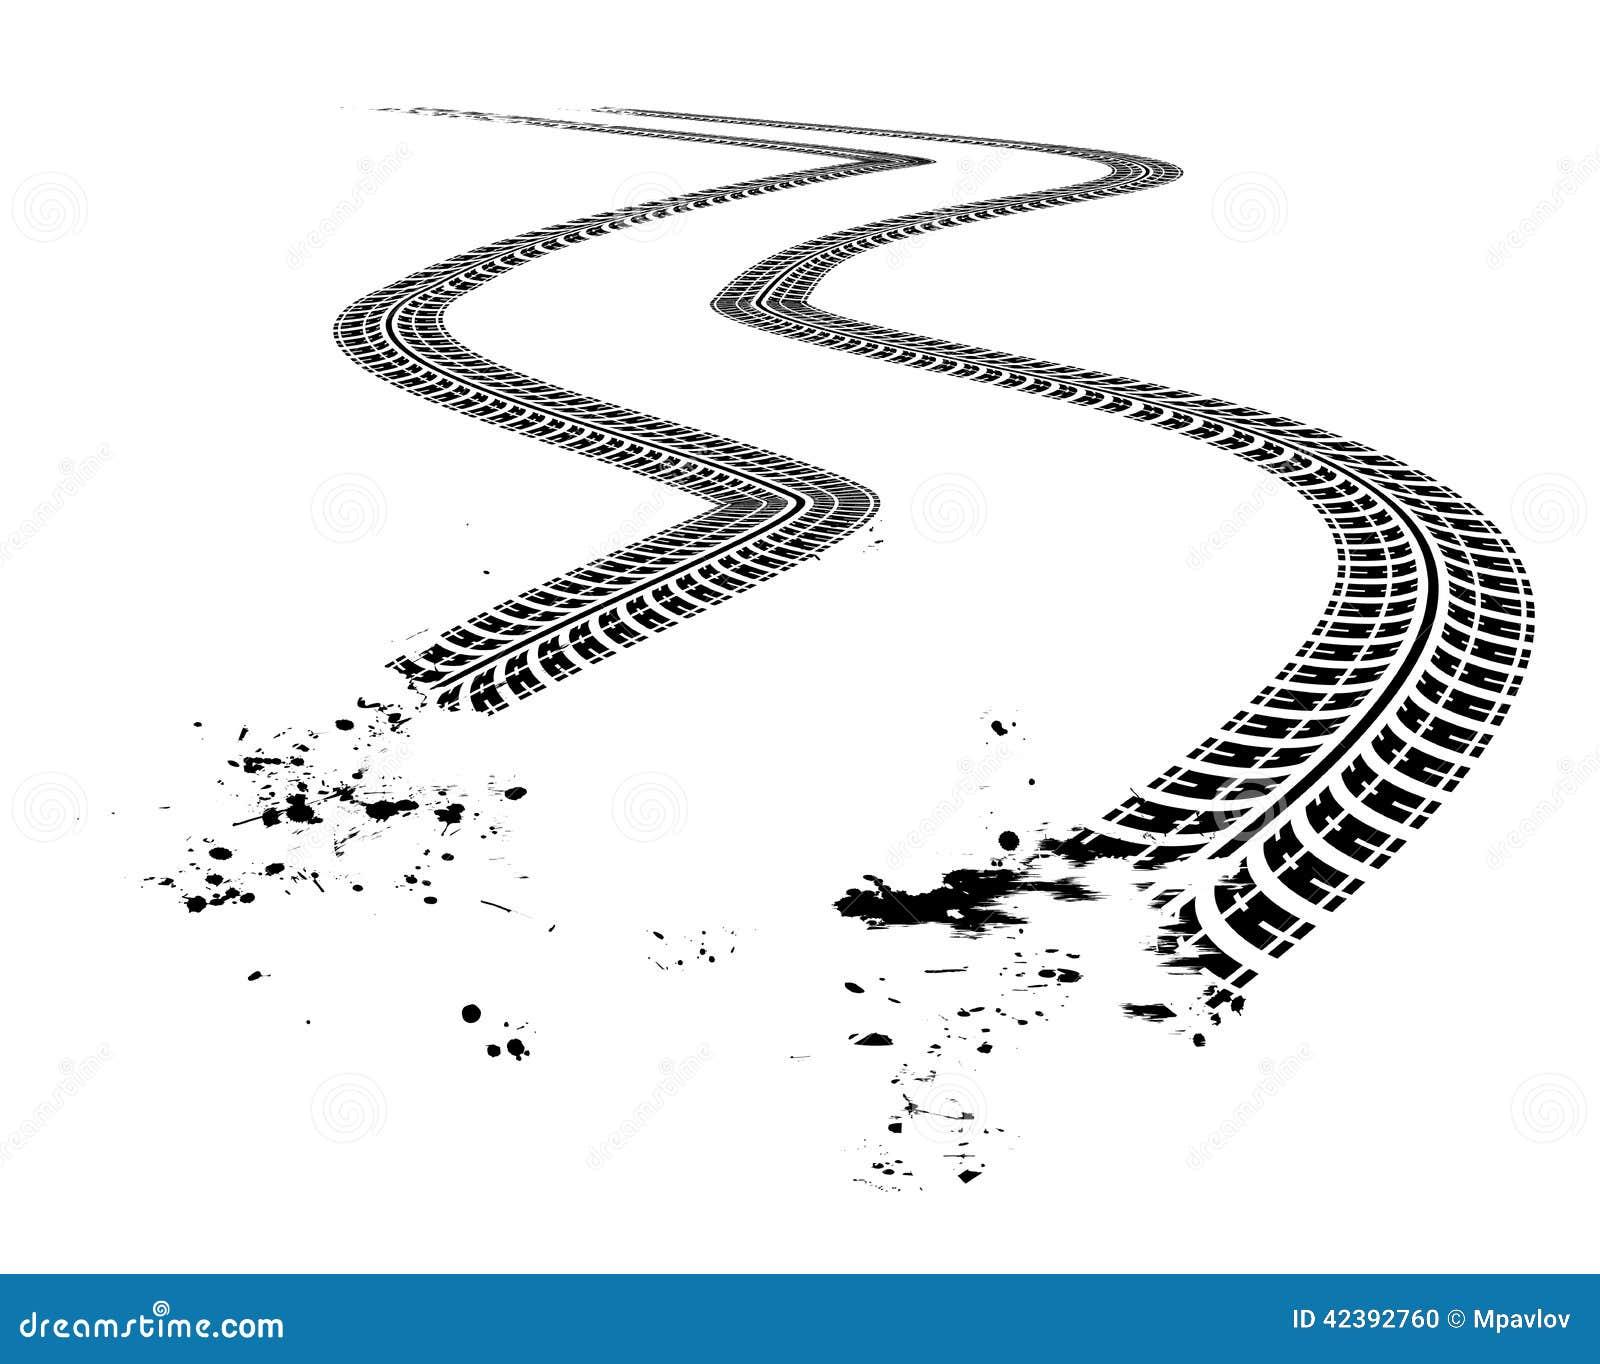 vector clipart tire tracks - photo #23